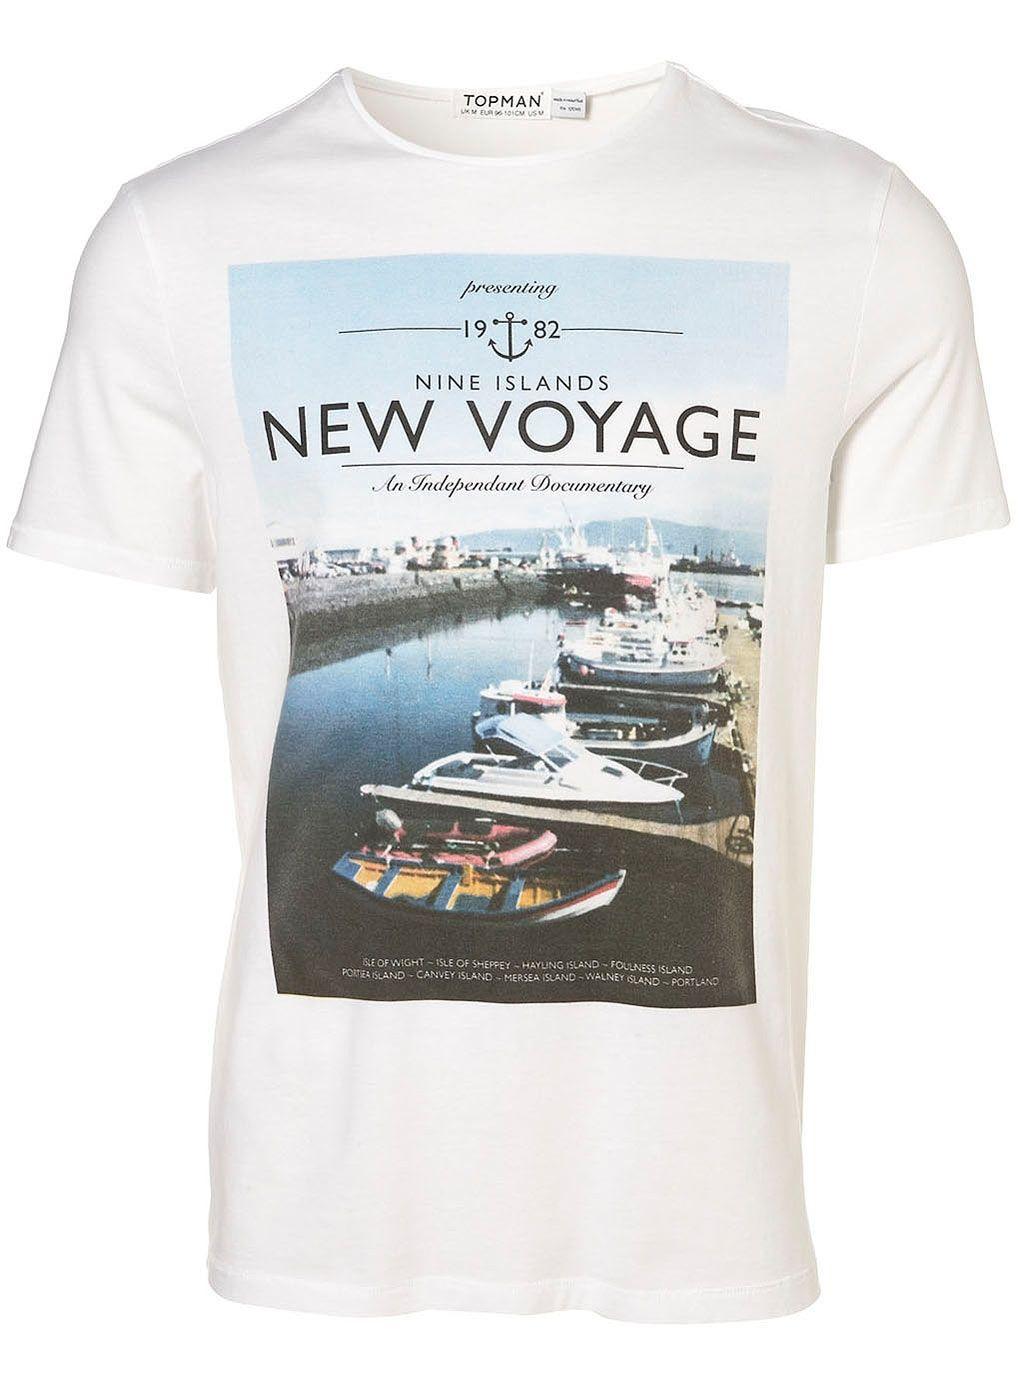 T Shirt Printing Companies Local T Shirt Printing Companies T